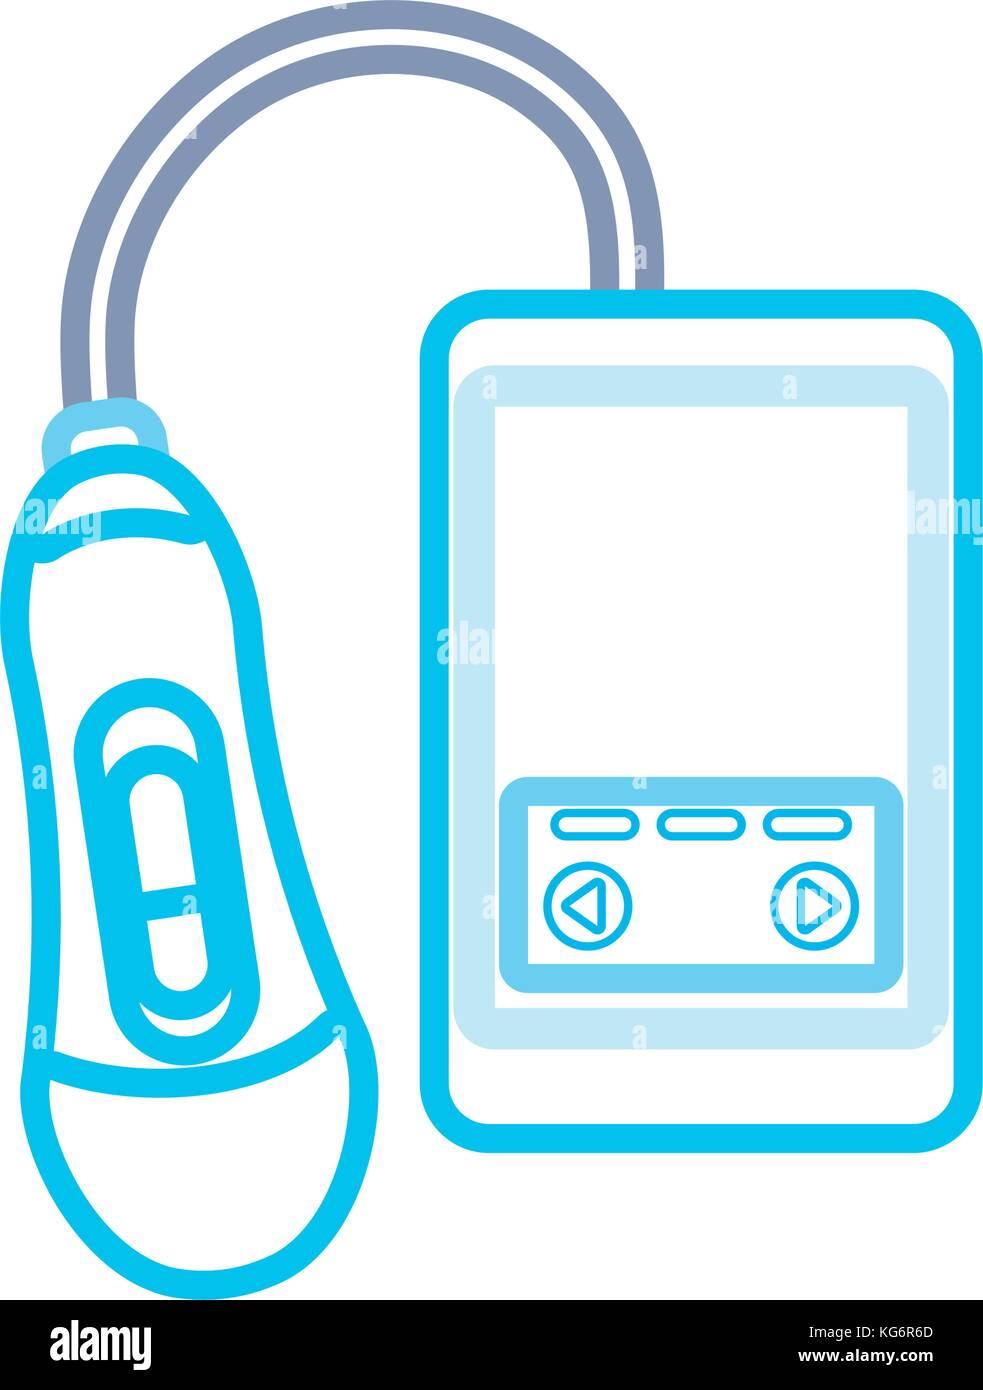 ultrasound cystem vector illustration - Stock Image